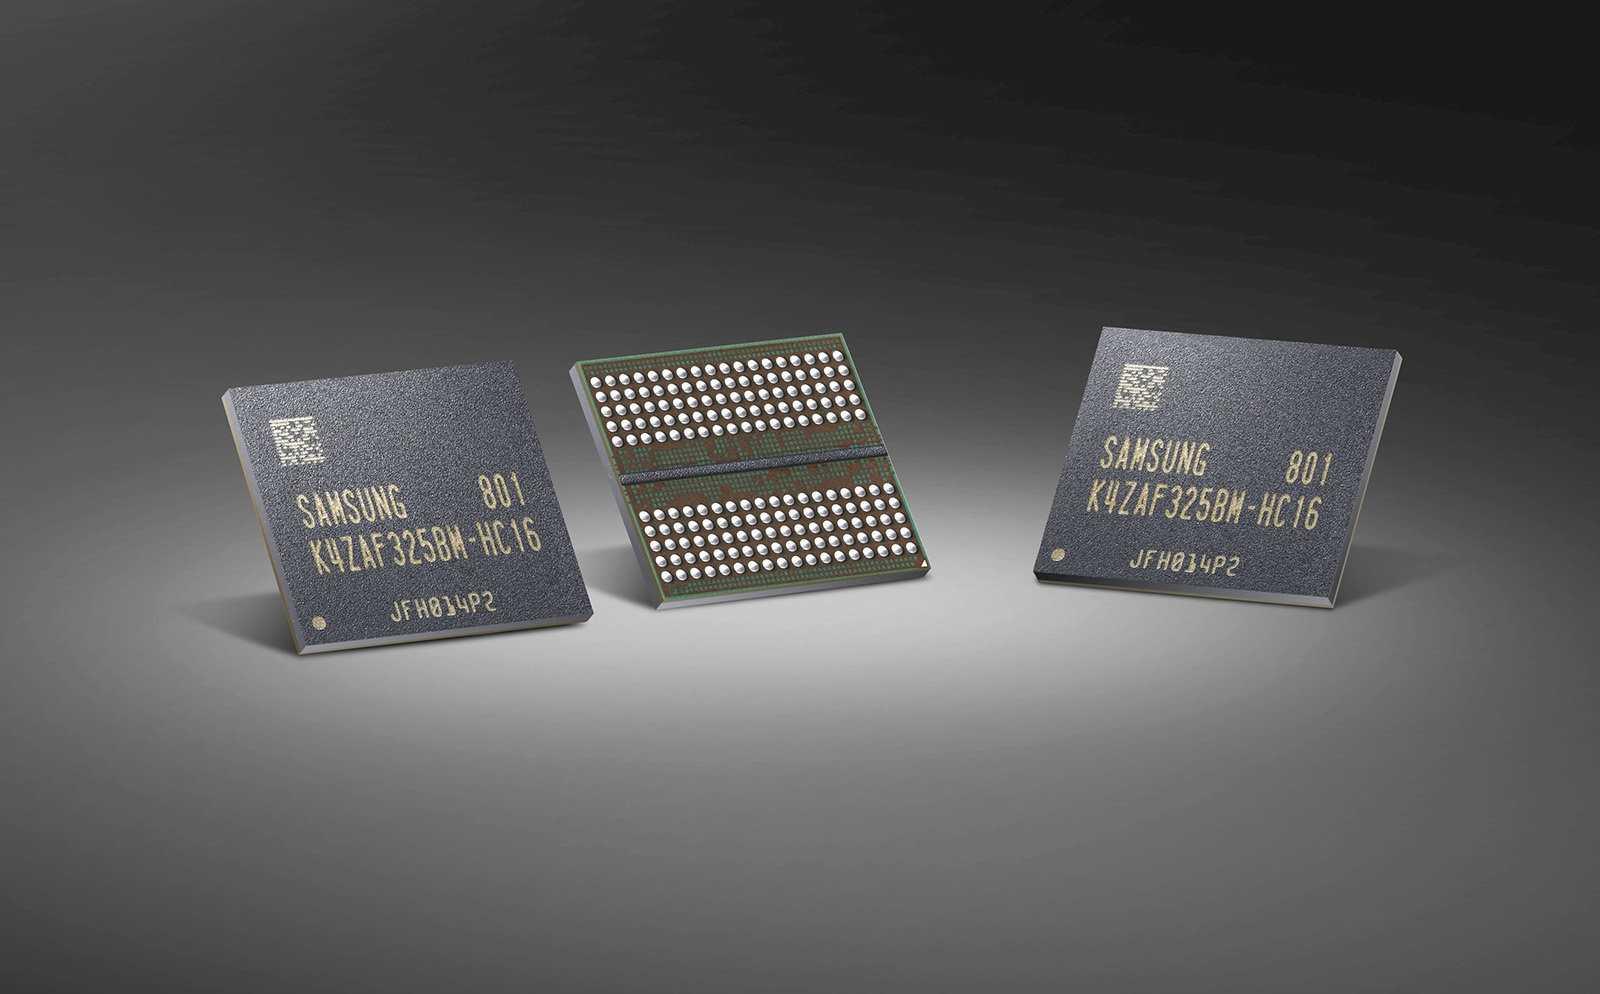 Тесты чипов памяти samsung, micron и hynix на процессорах amd ryzen 3000